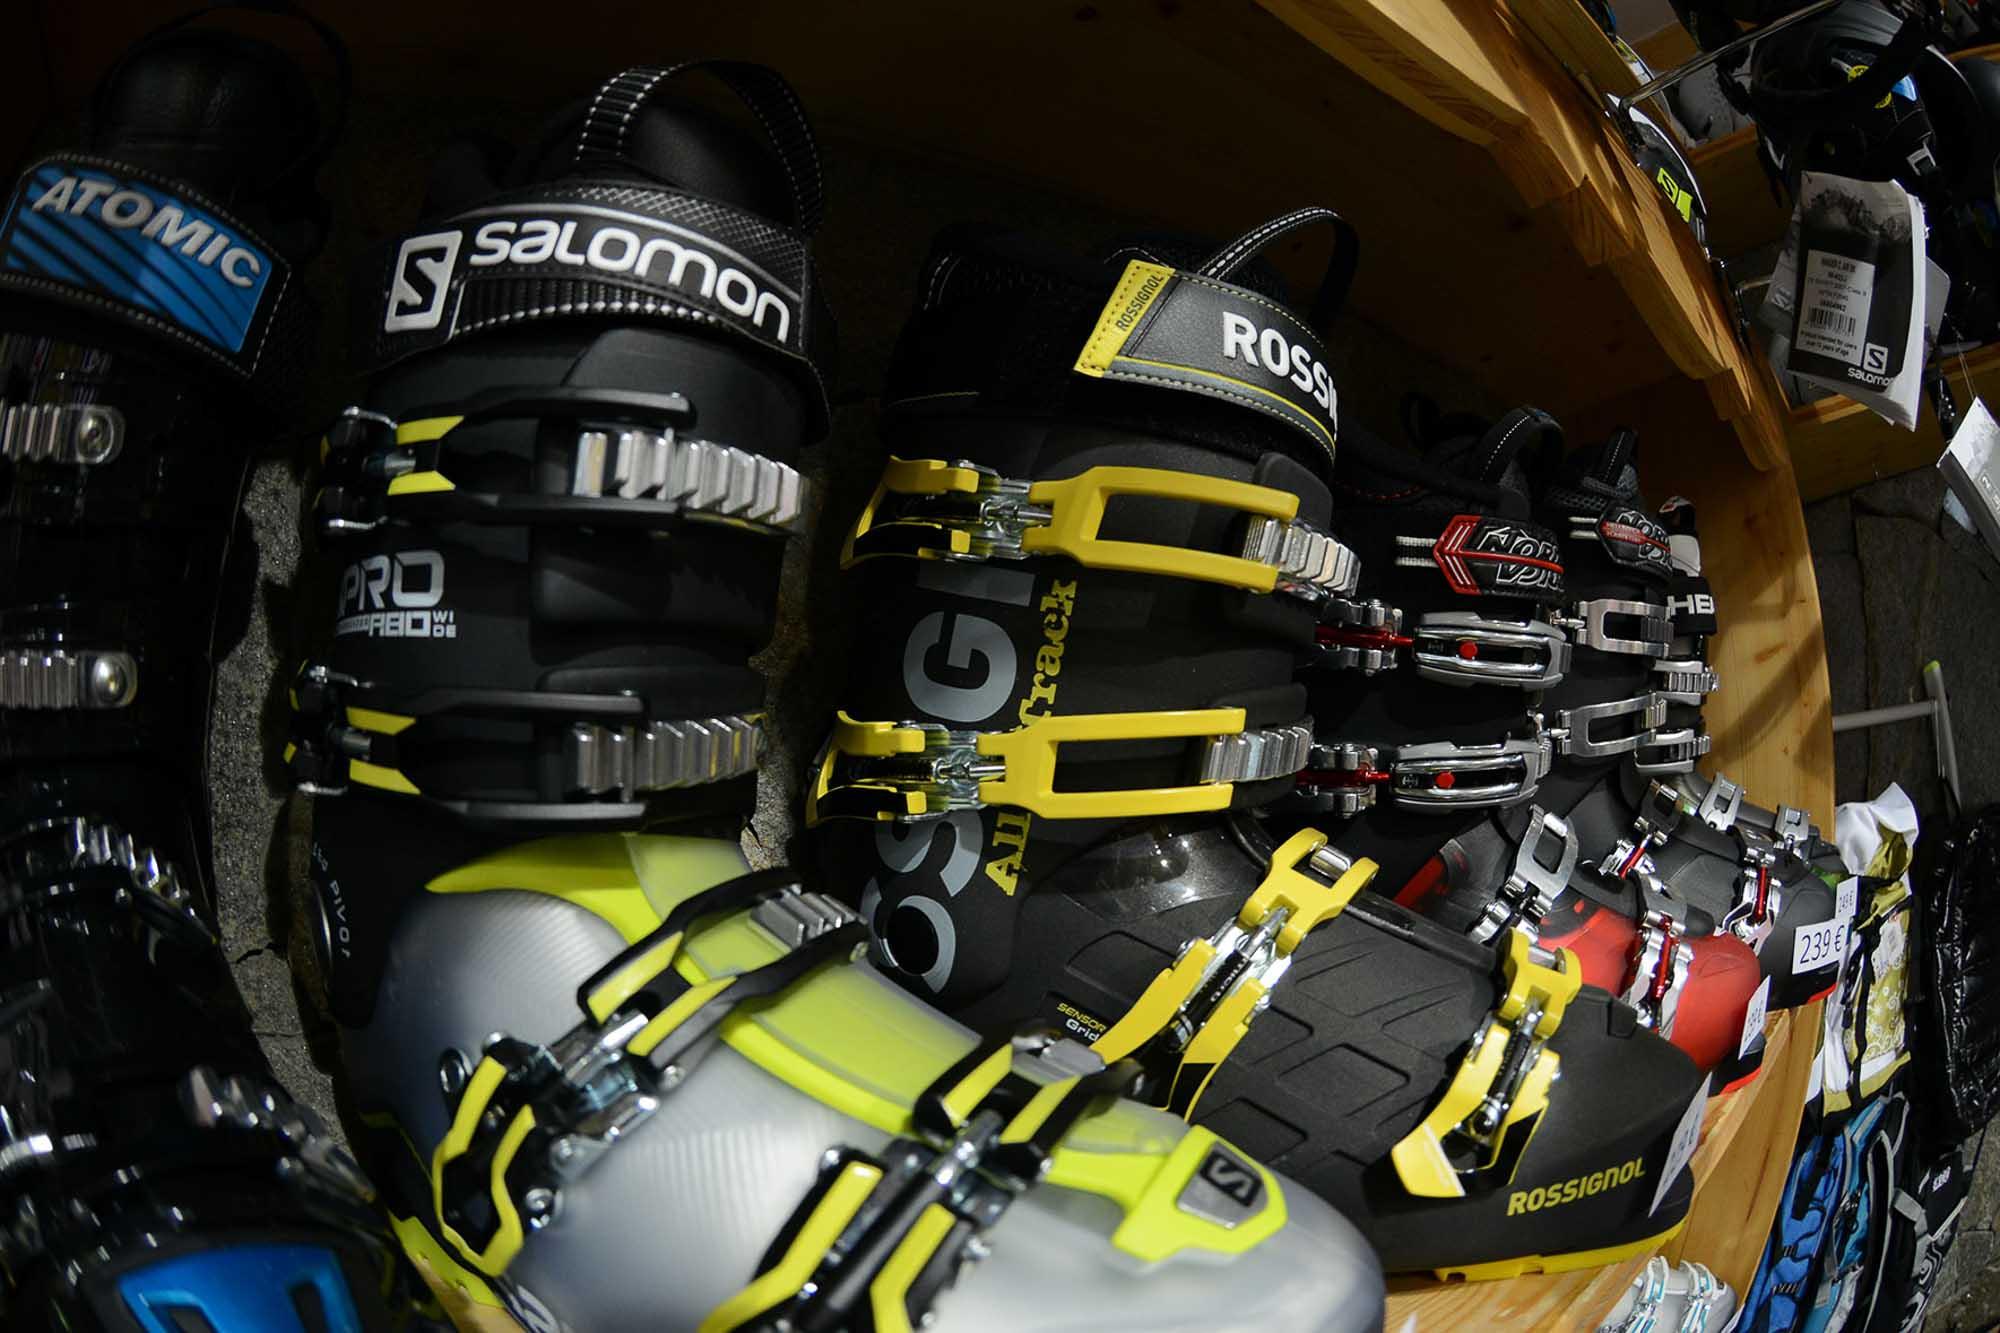 chaussure de location de ski Salomon